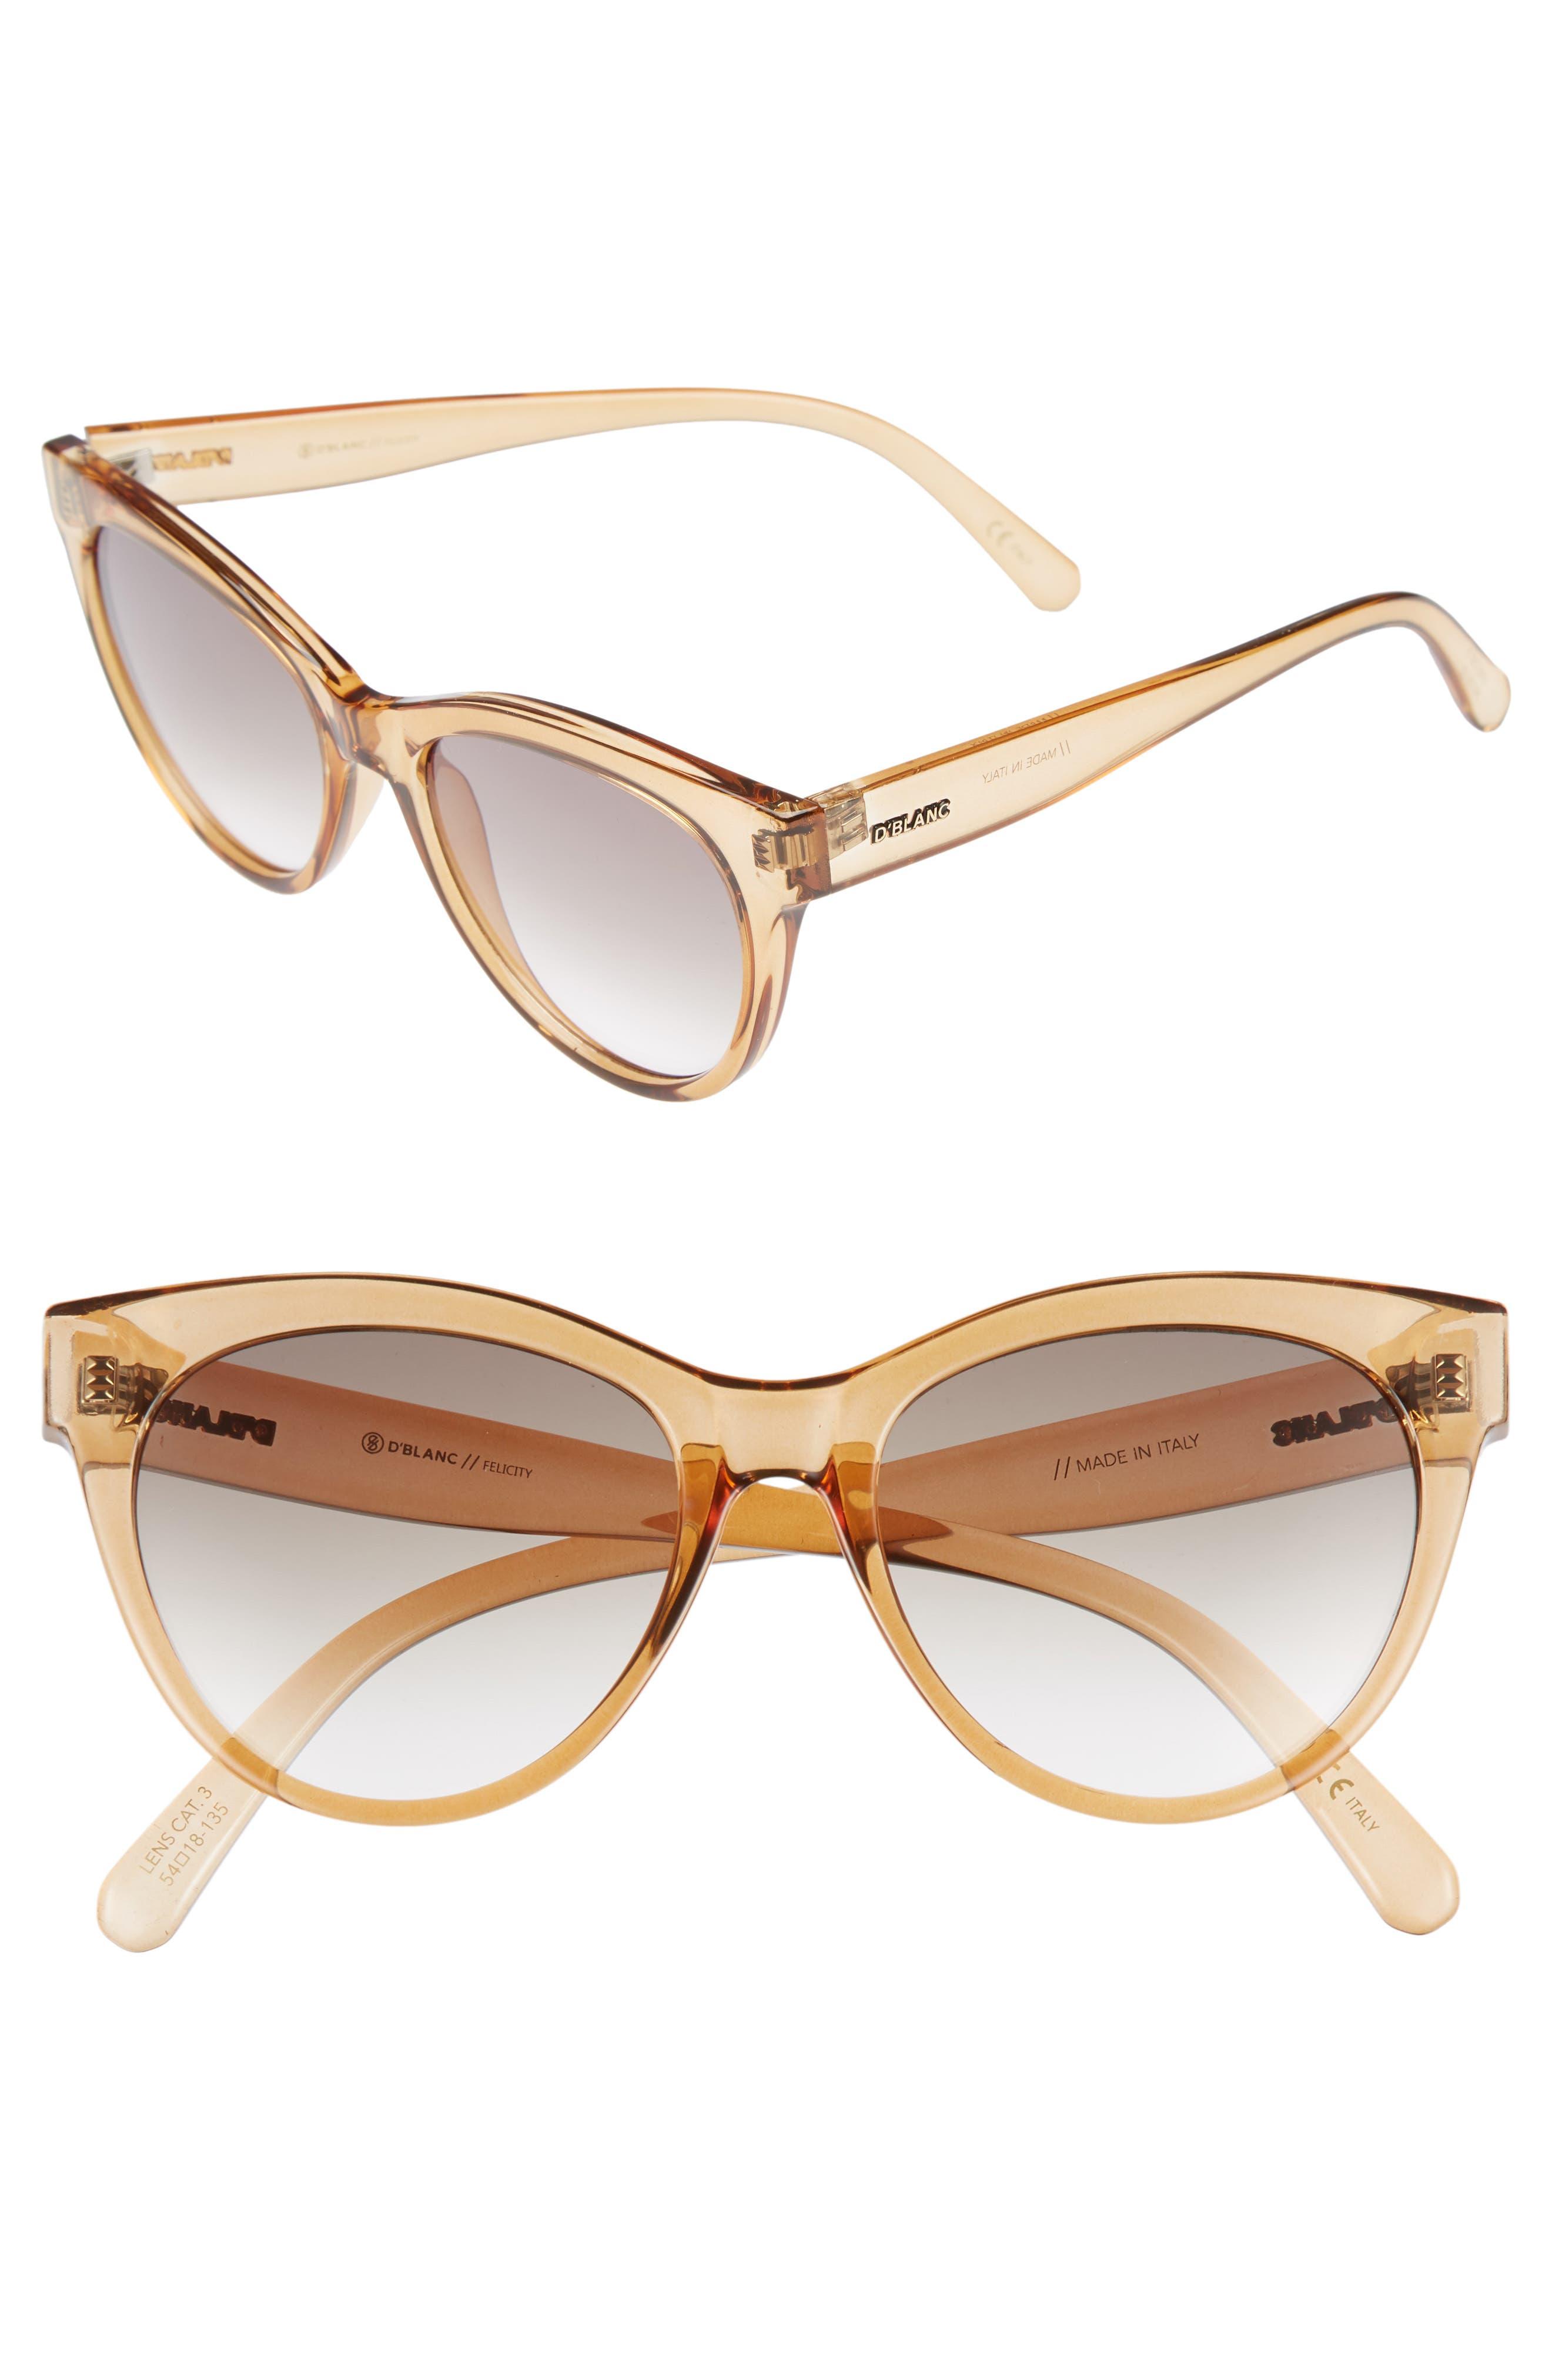 D'BLANC Felicity 54mm Cat Eye Sunglasses,                             Main thumbnail 1, color,                             Chai Gloss